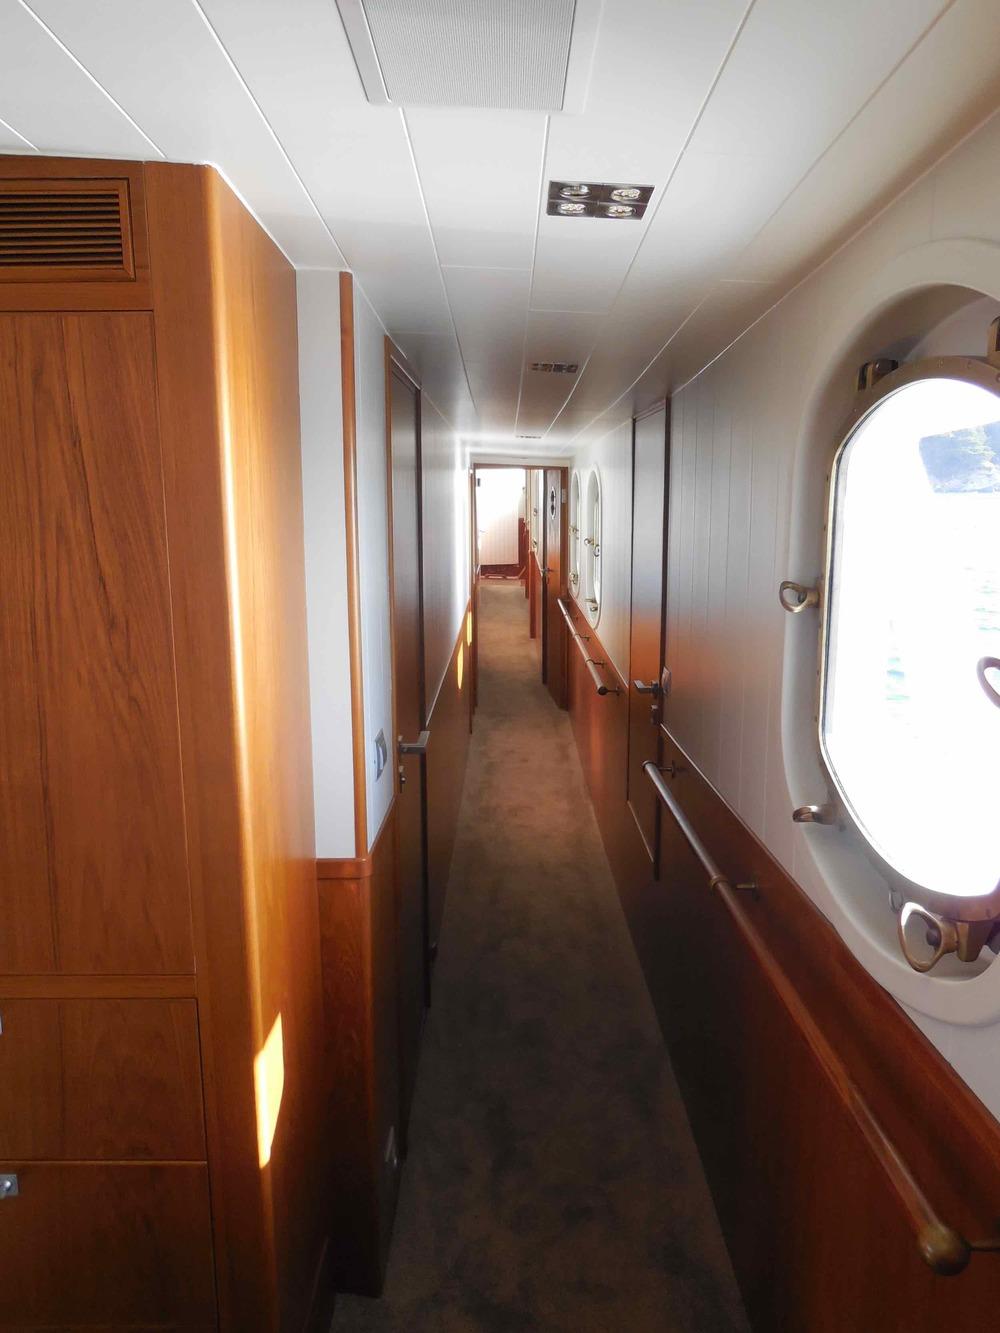 Motor yacht Drenec hallway.jpeg